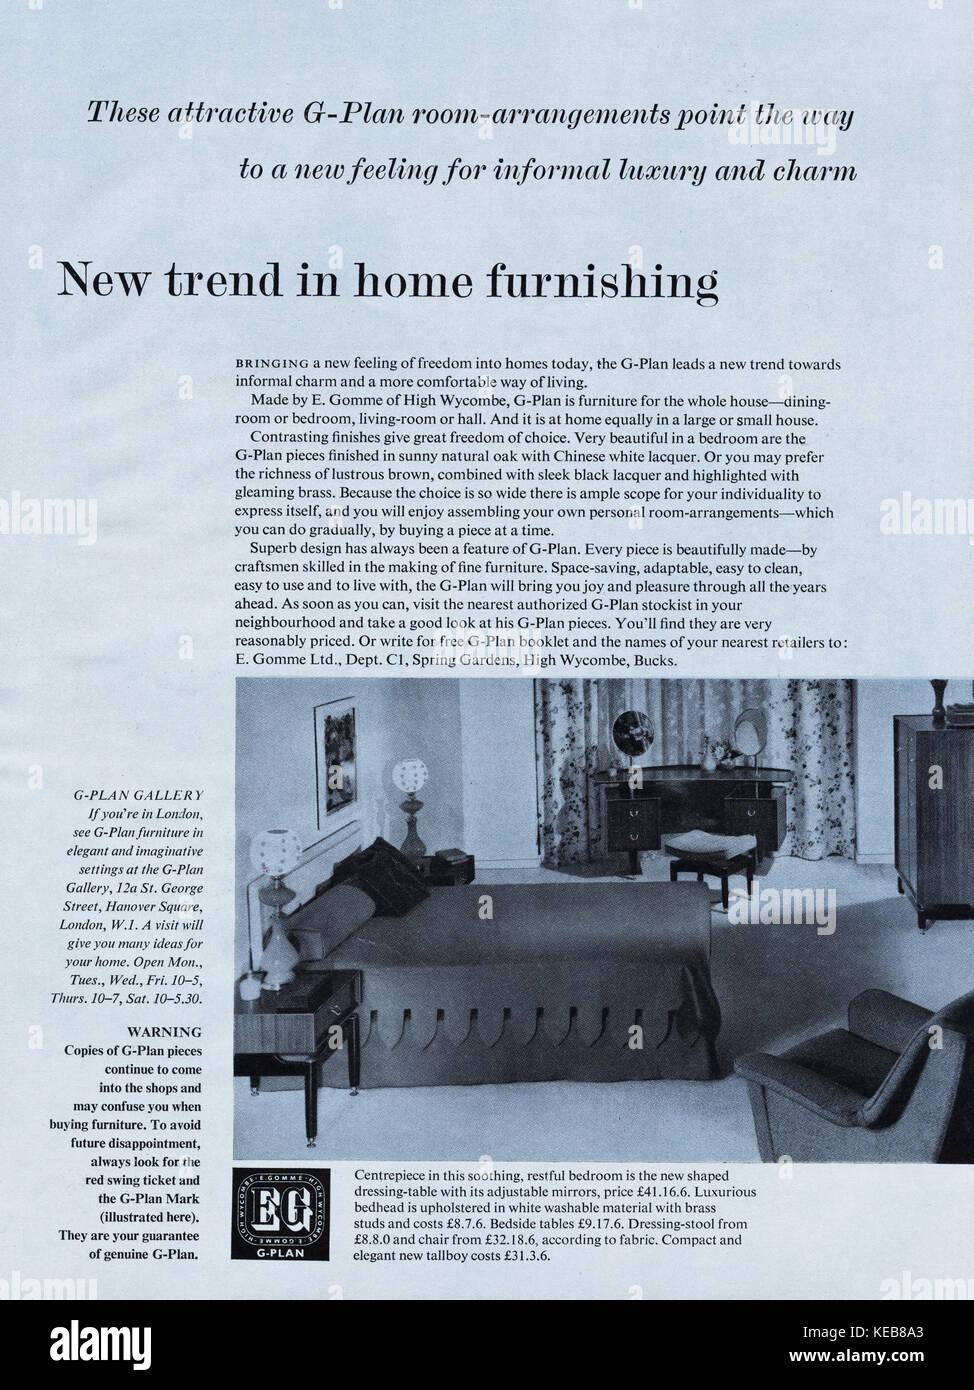 1950s advert old vintage original british magazine advertisement advertising G-Plan furniture dated 1958 - Stock Image